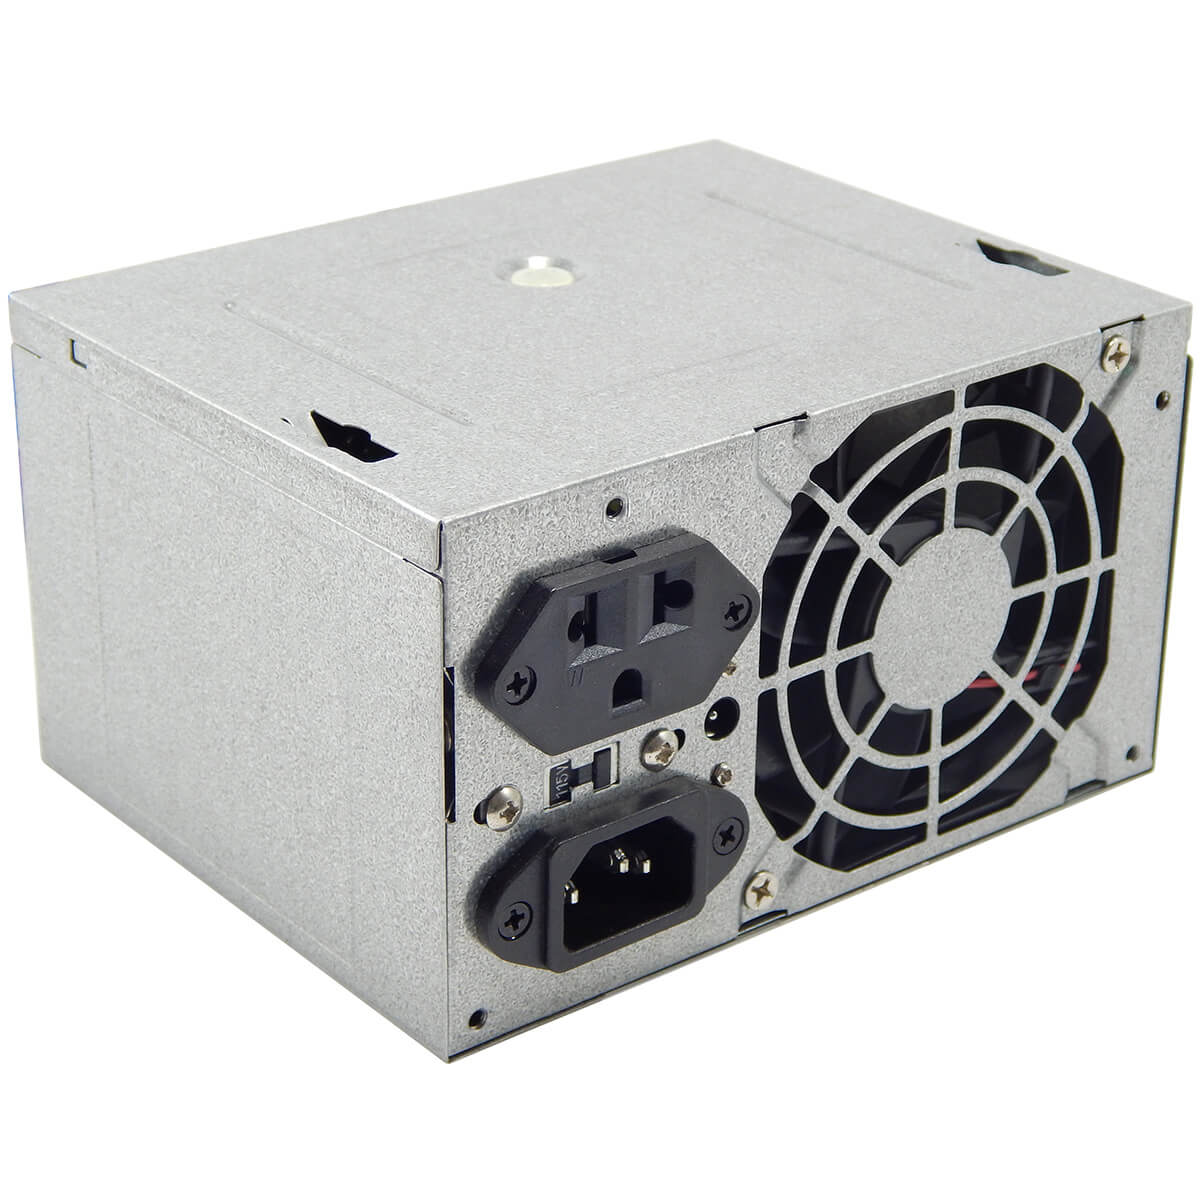 Fonte Atx Ever Power PX-250EOE2N 250w Reais 20 Pinos - Usada